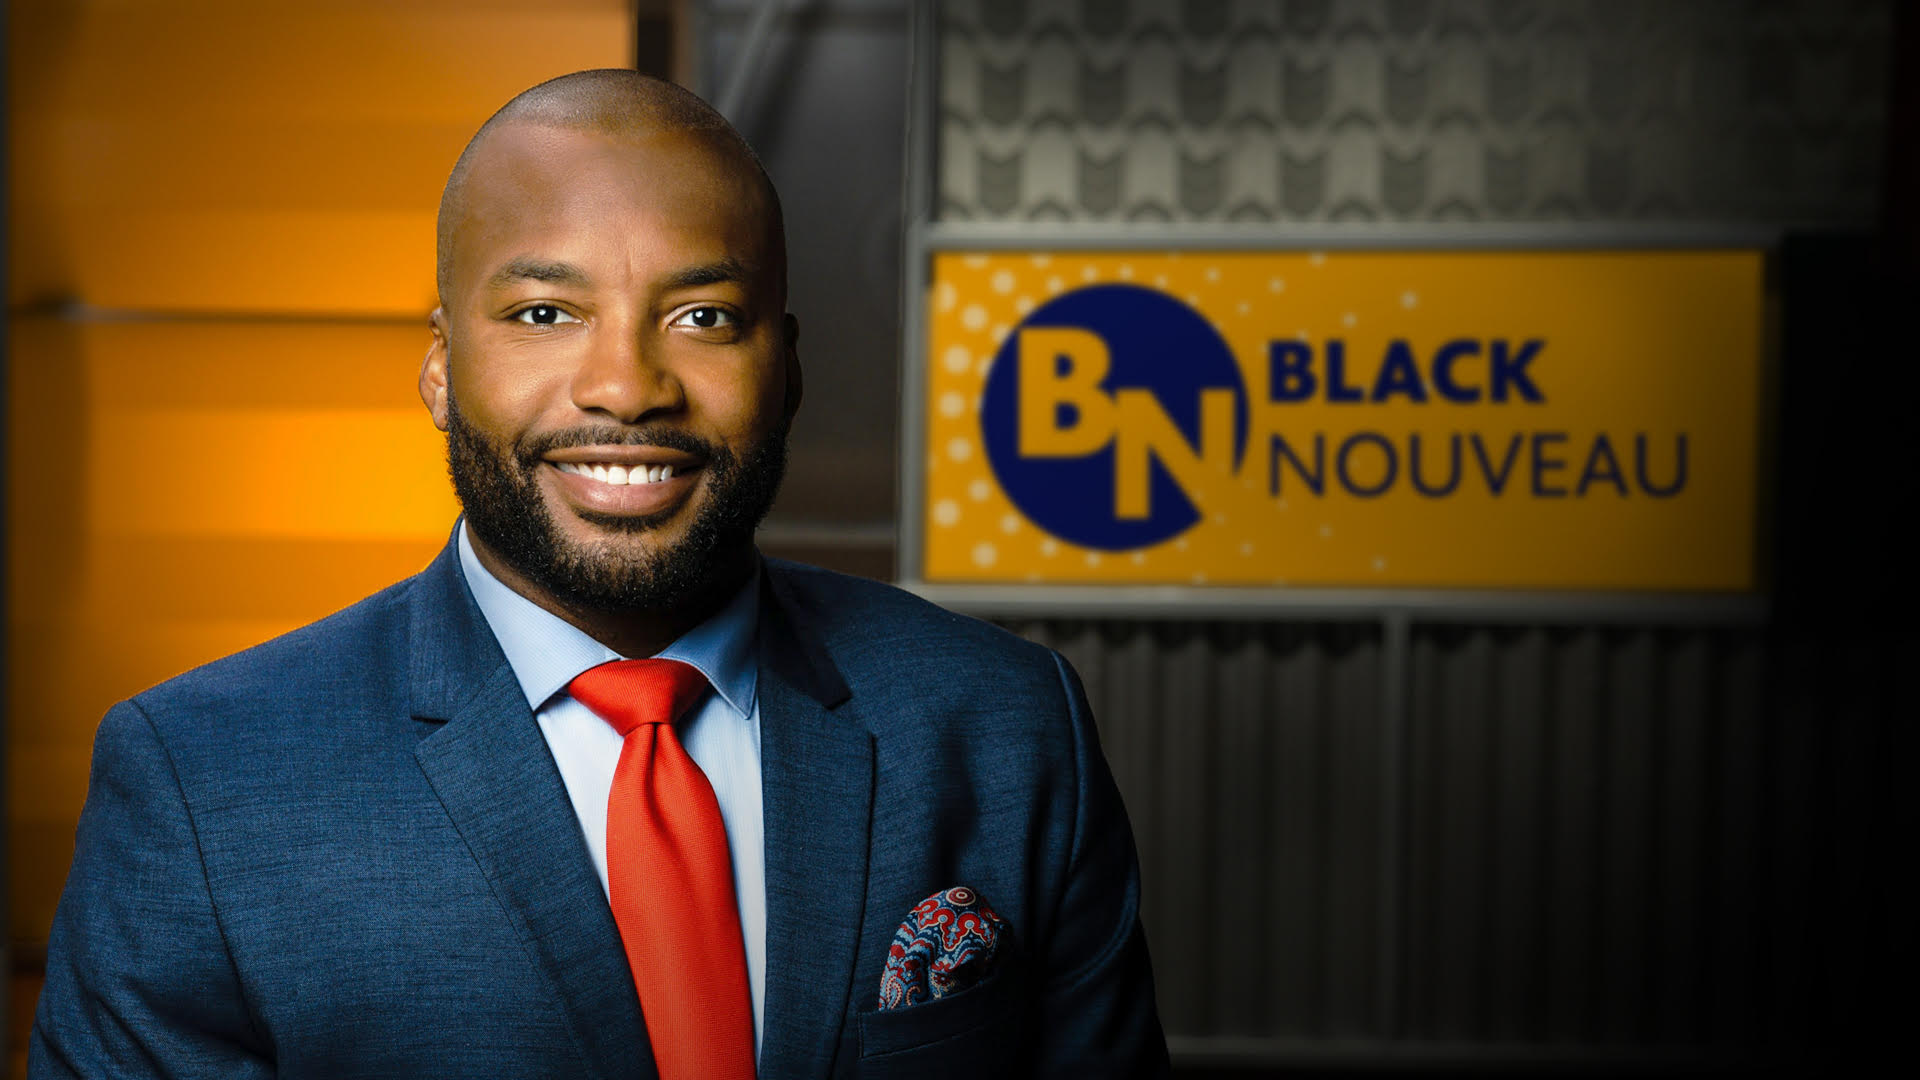 New Season of Black Nouveau Brings New Host